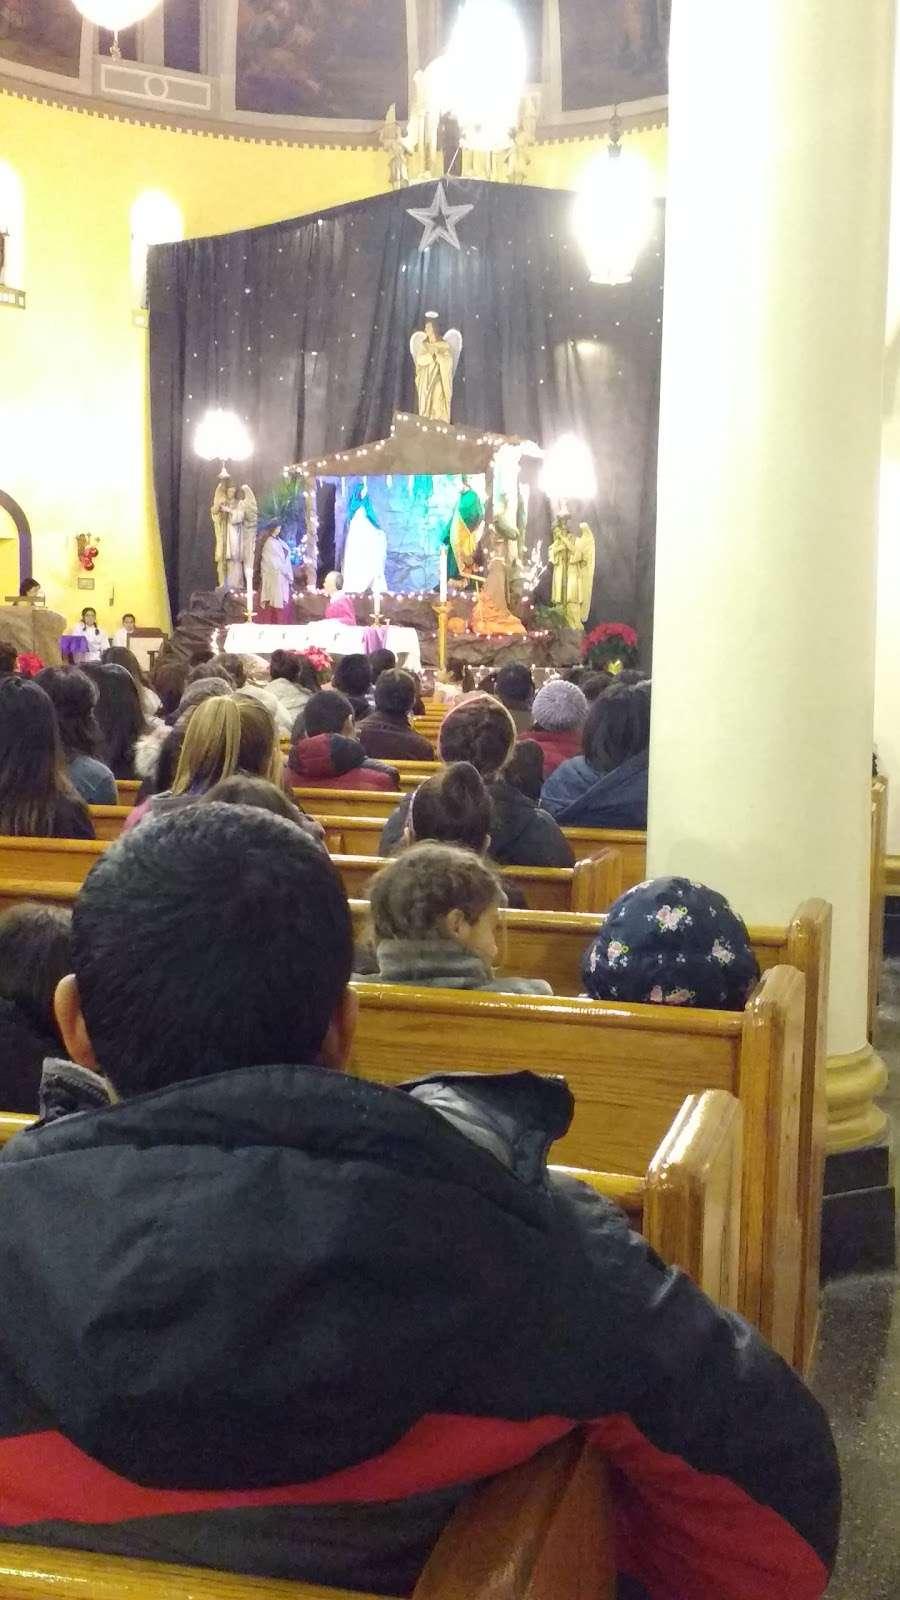 St Anthonys Catholic Church Parish Office - church    Photo 7 of 10   Address: 1510 S 49th Ct, Cicero, IL 60804, USA   Phone: (708) 652-0231